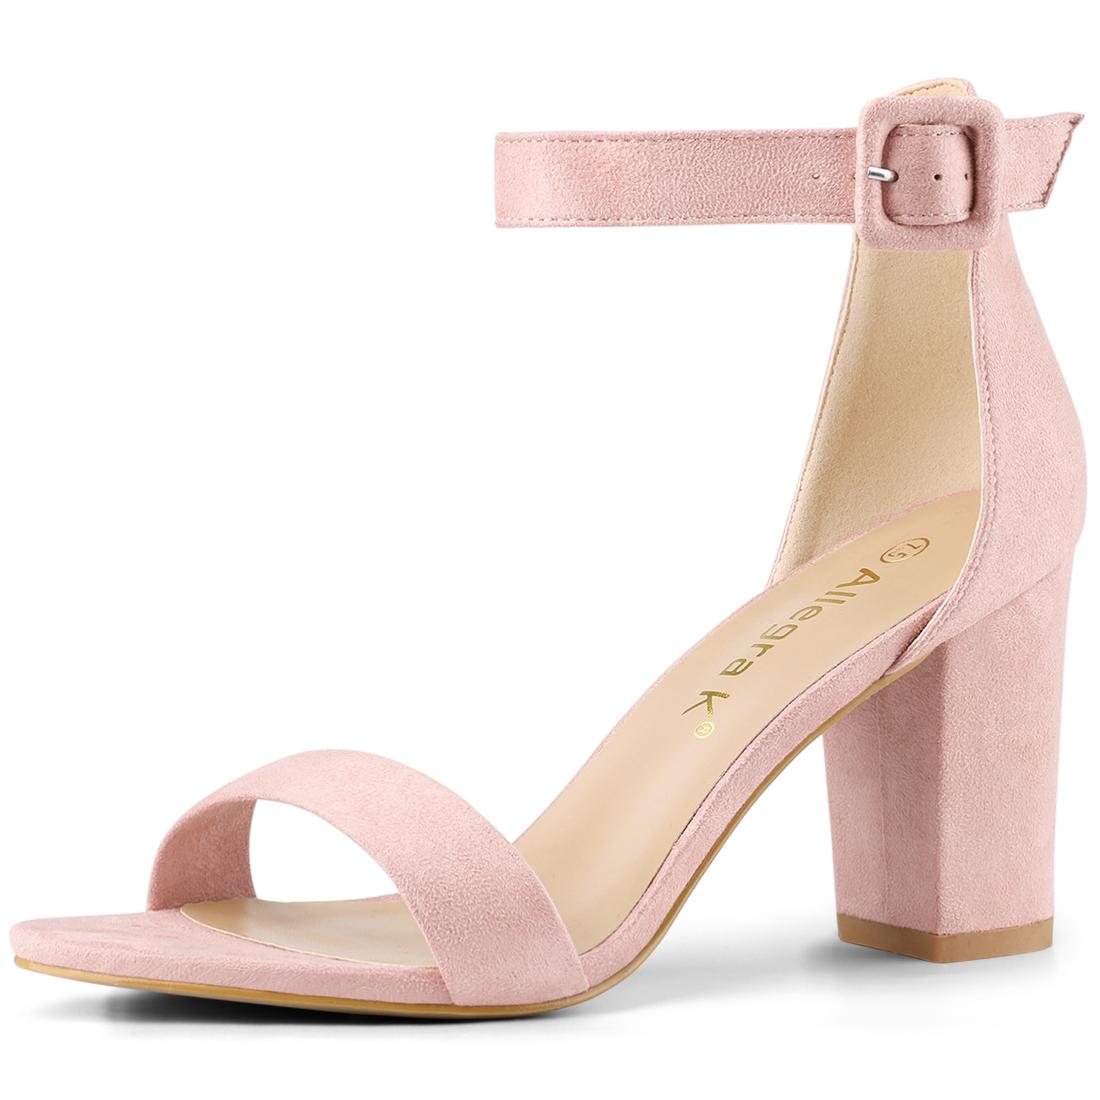 Allegra K Women's Chunky High Heel Ankle Strap Sandals Light Pink US 11